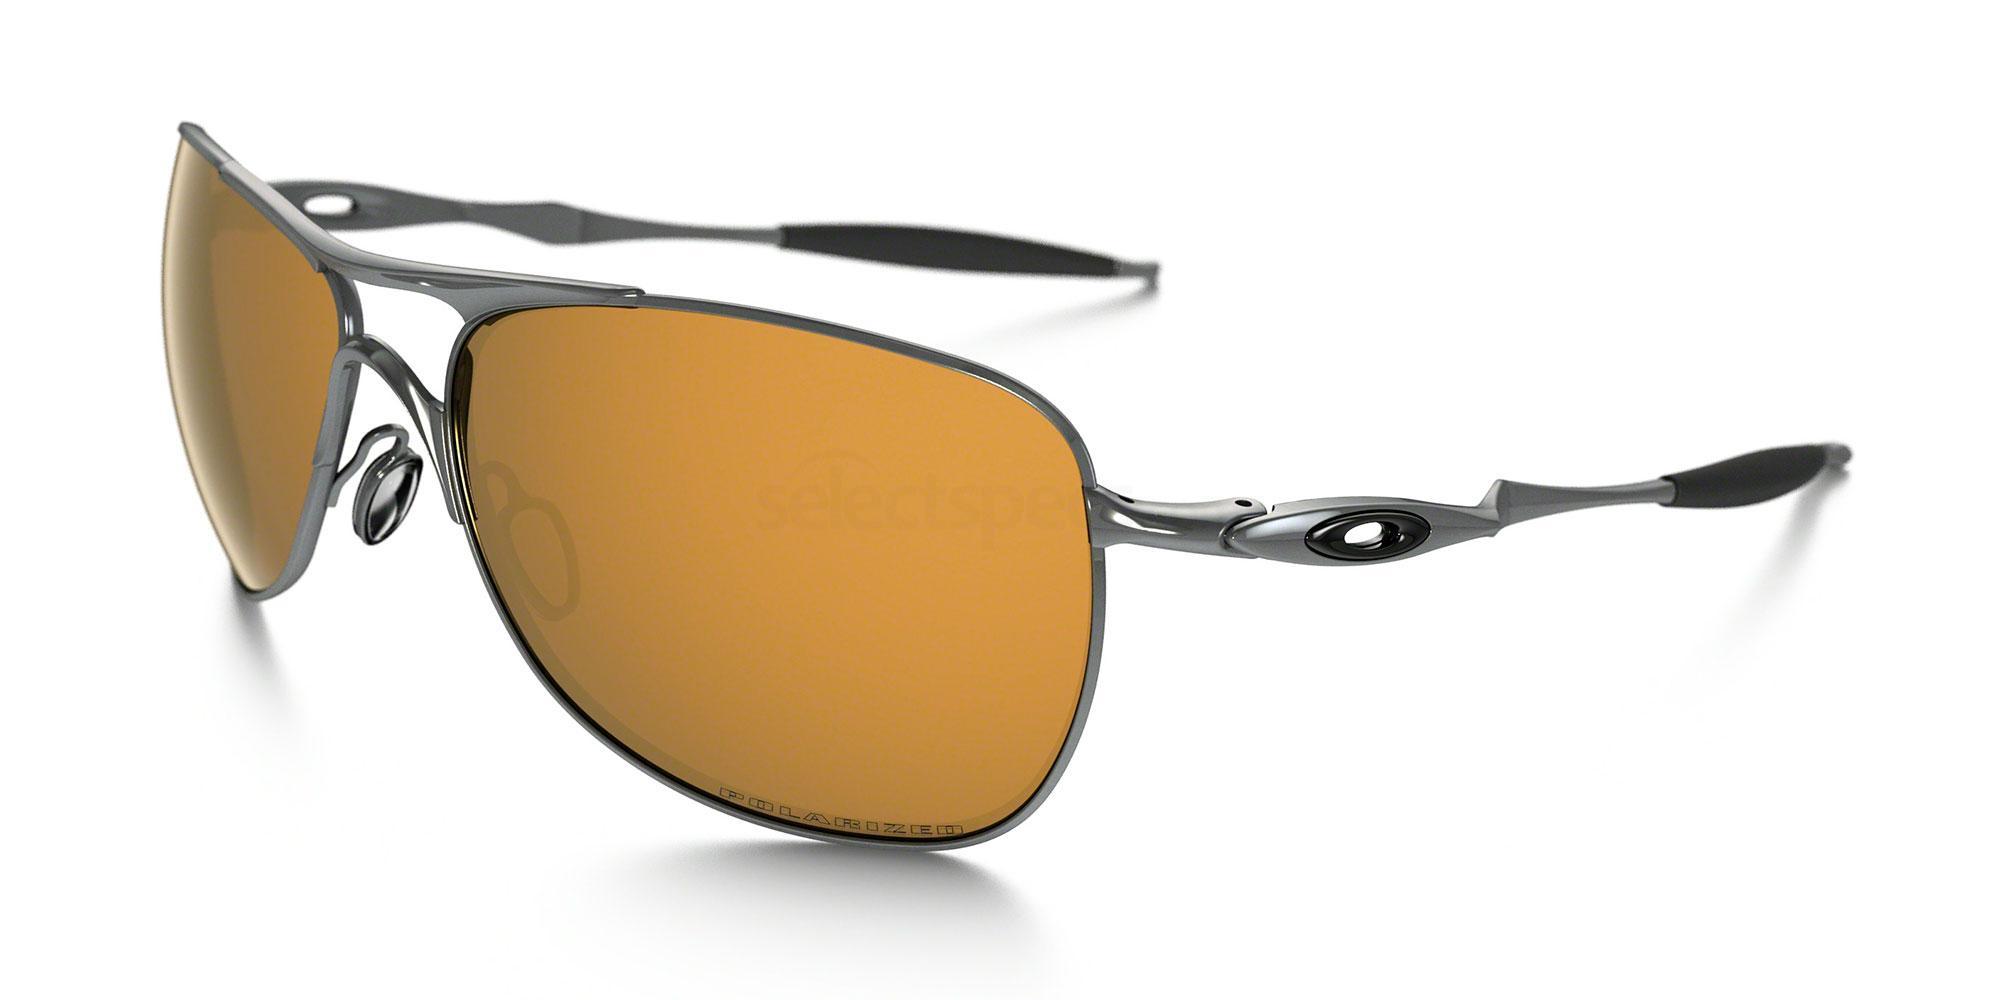 601401 OO6014 TI CROSSHAIR (Polarized) Sunglasses, Oakley